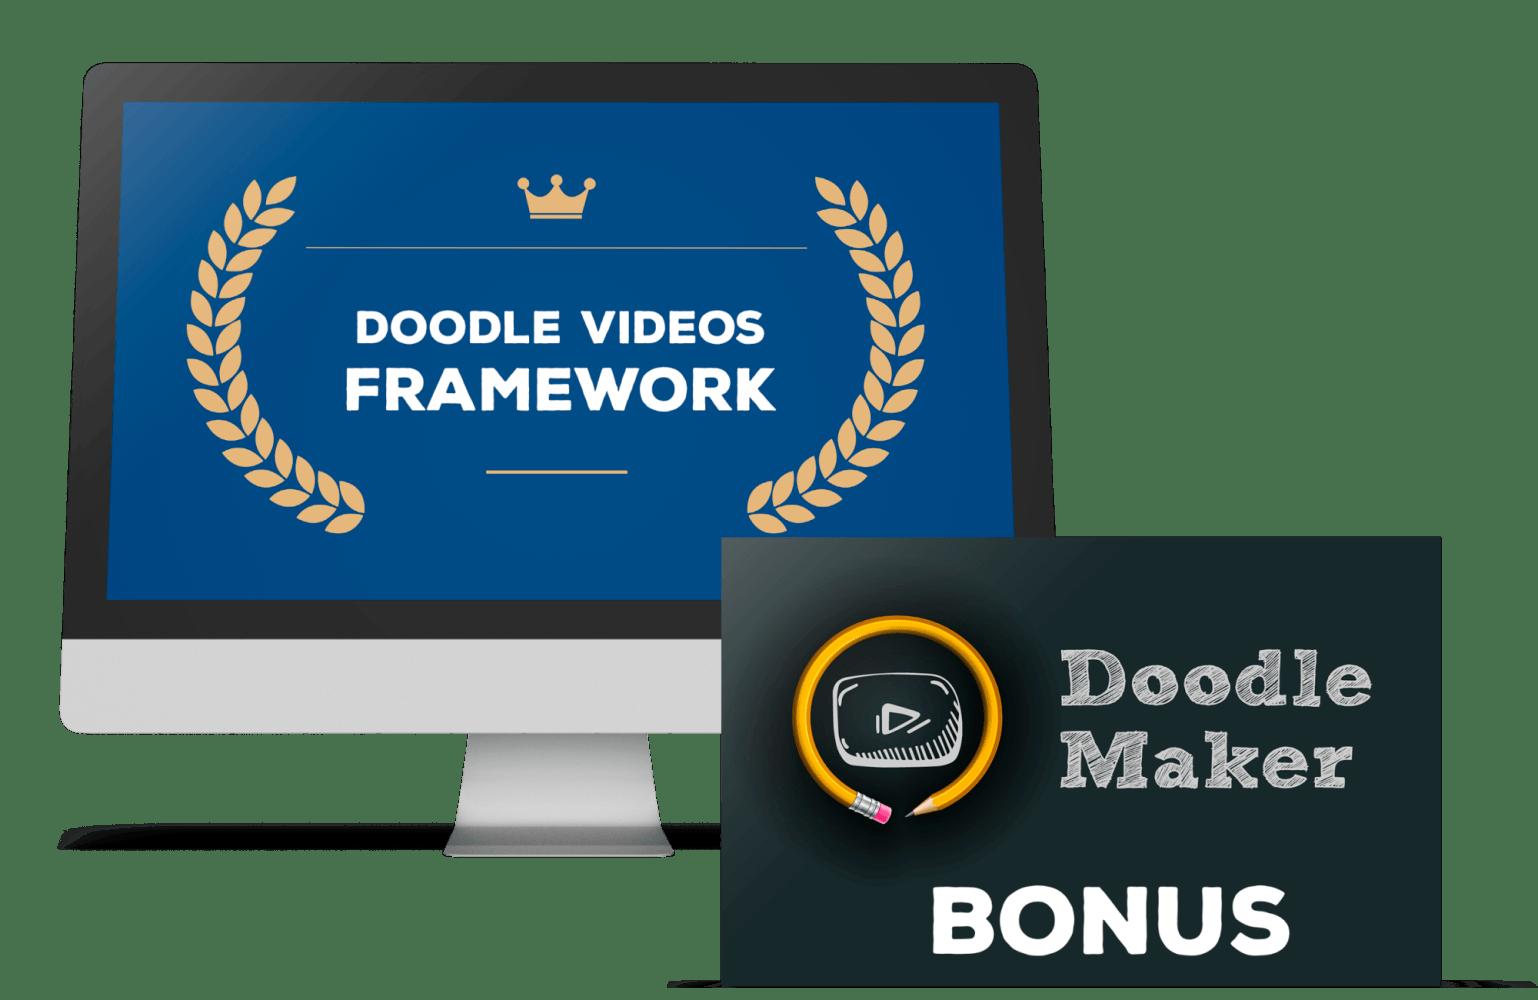 Doodle Maker Bonus 7 - Doodle Maker Video Script Format